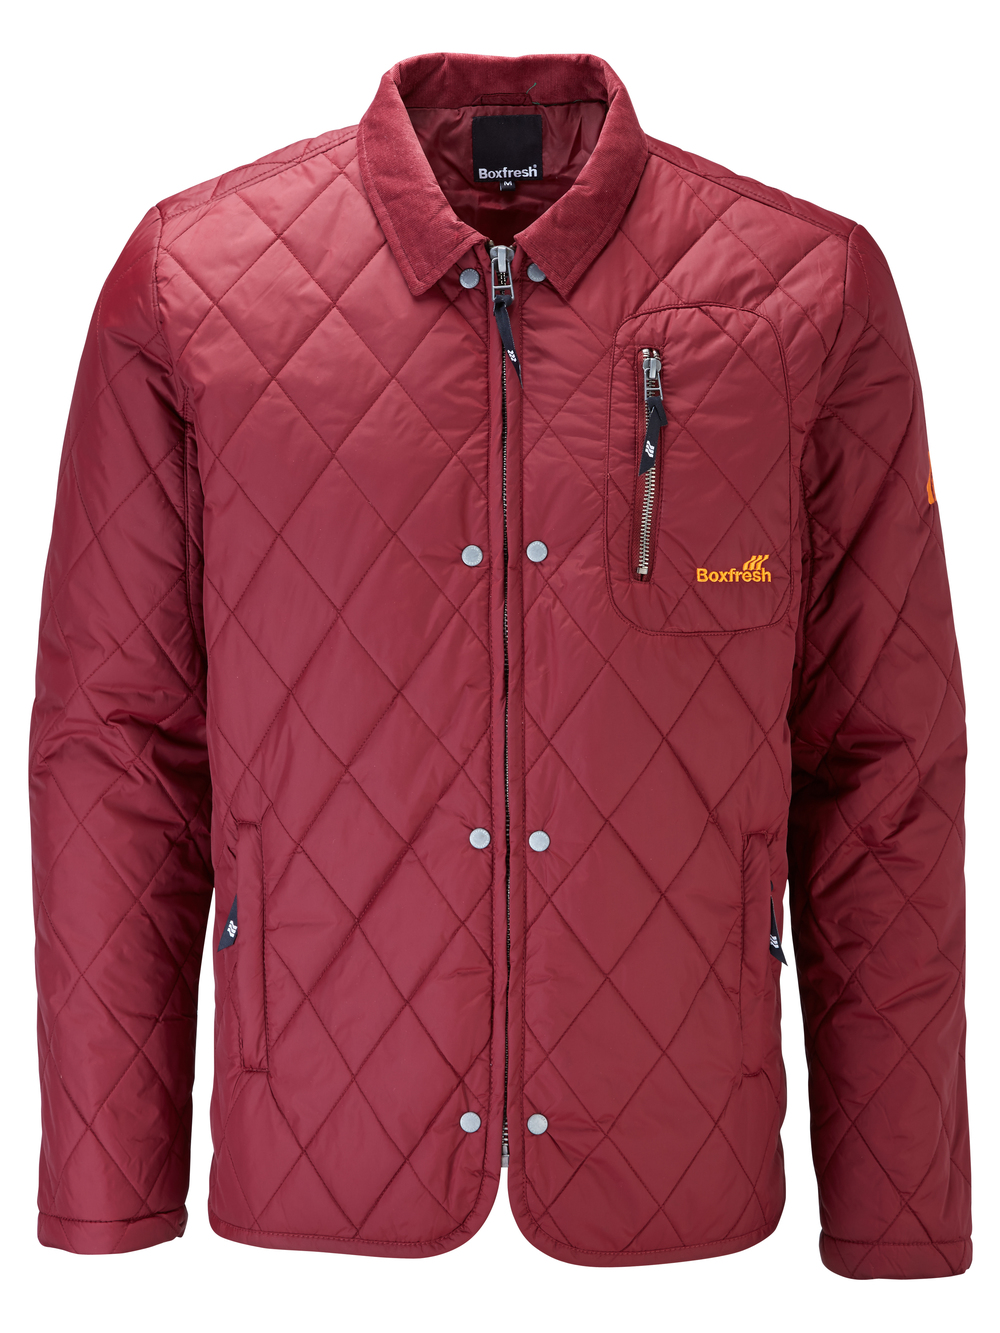 Boxfresh Jacket.jpg